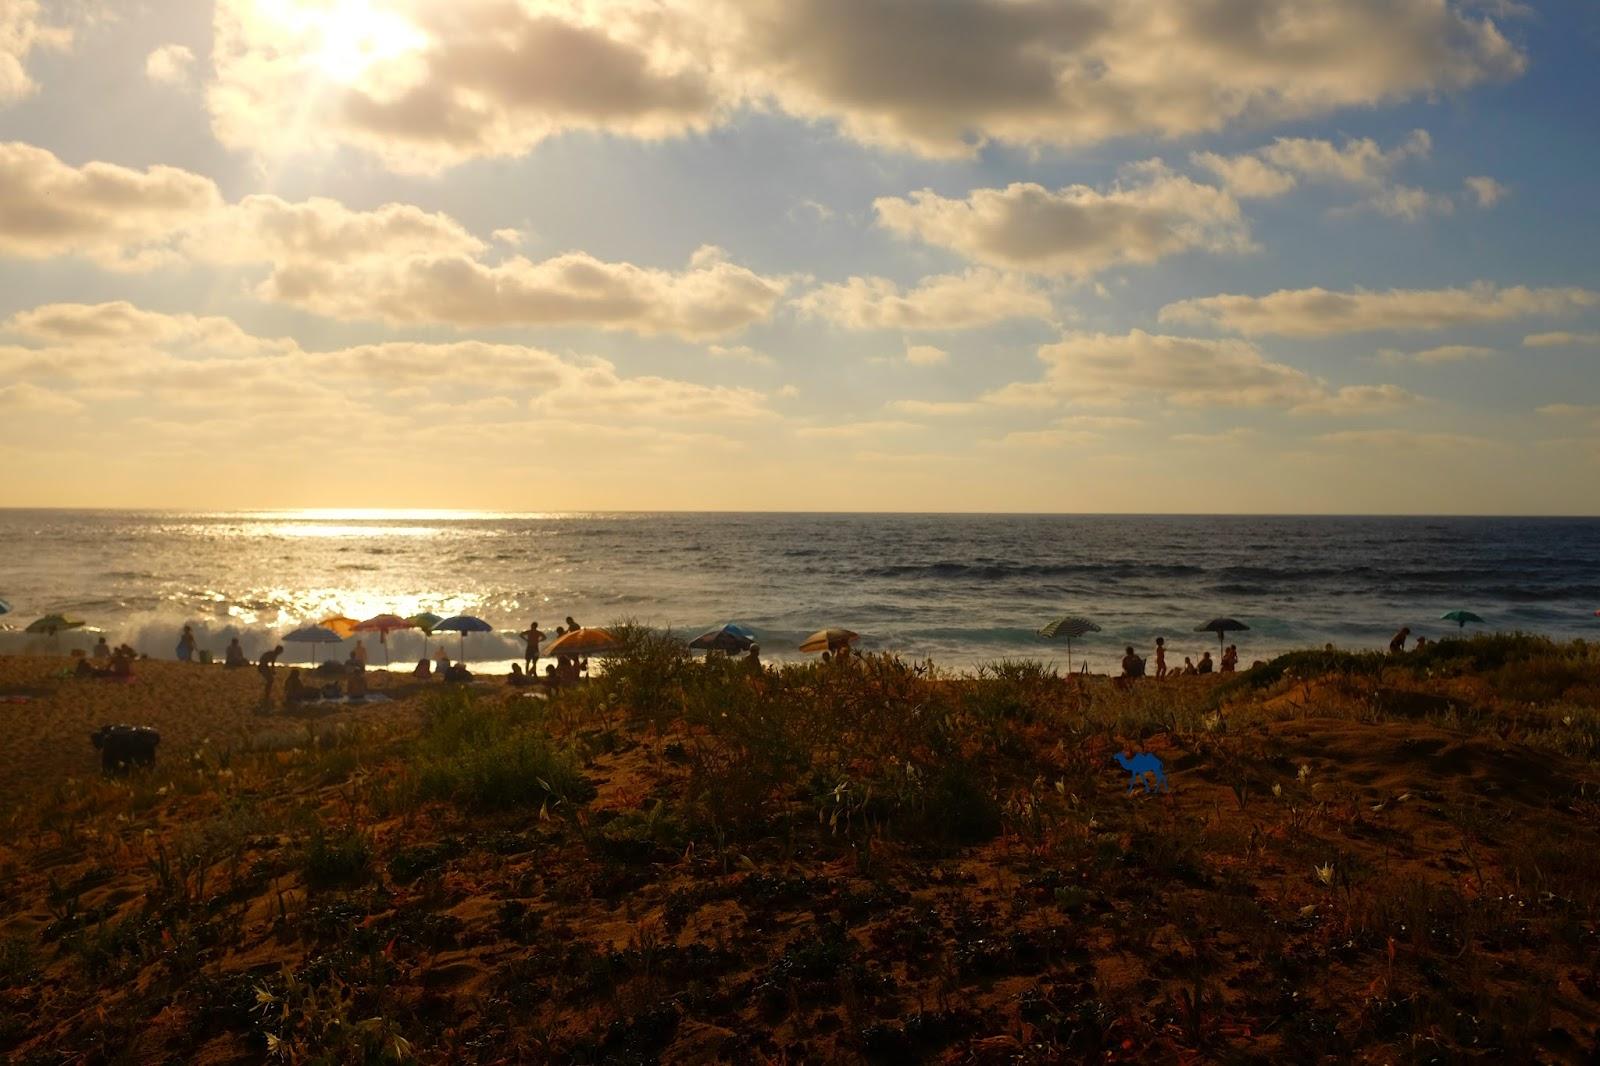 Le Chameau Bleu - Spiaggia di Porte Alabe